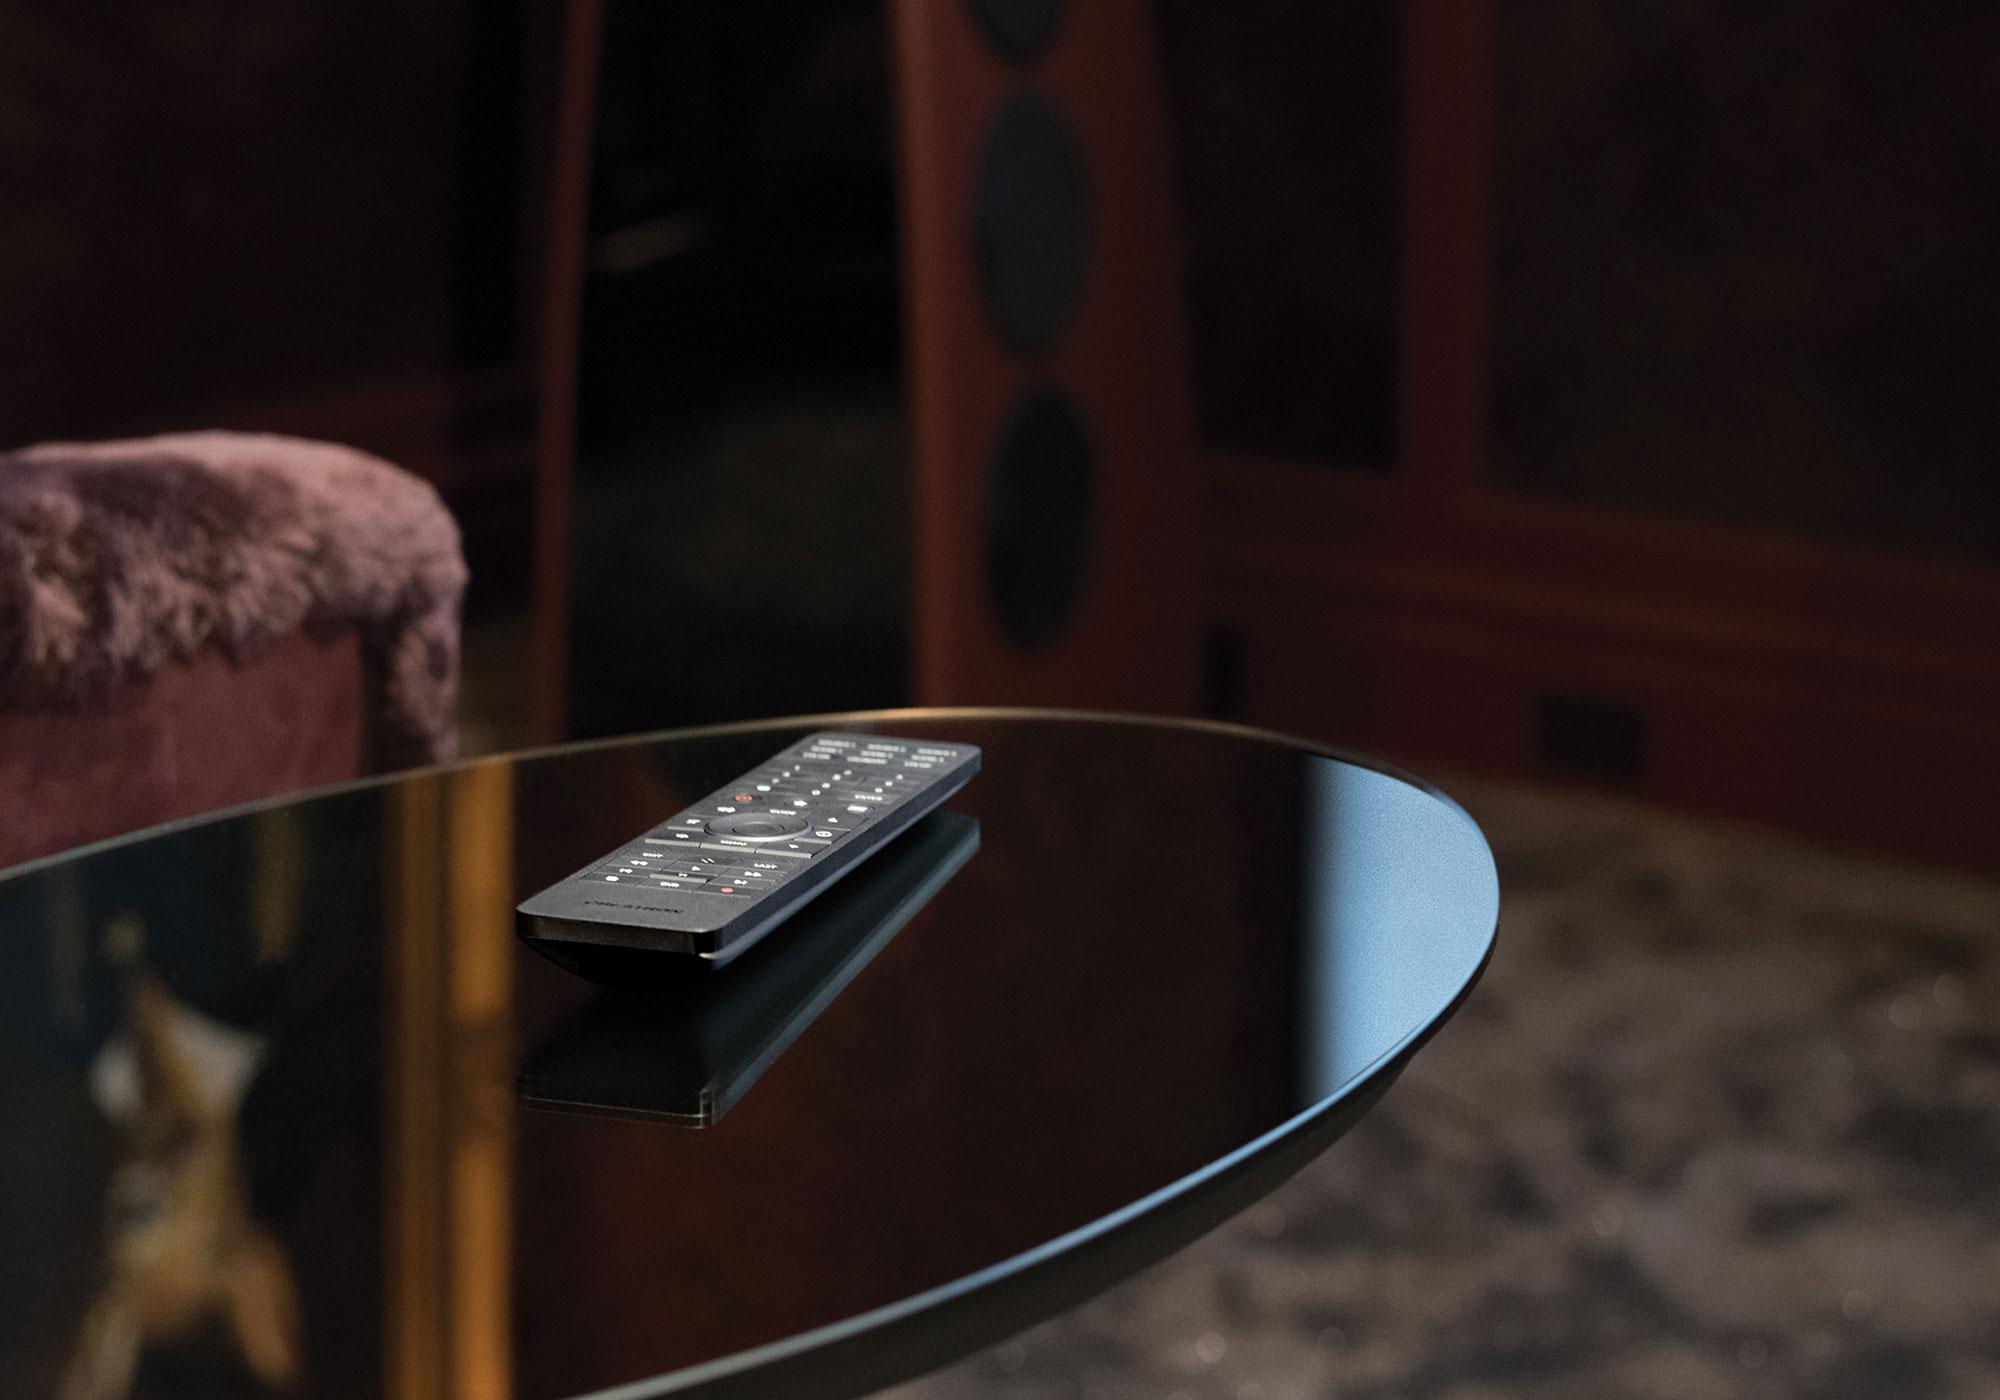 theater, remote, handheld remote